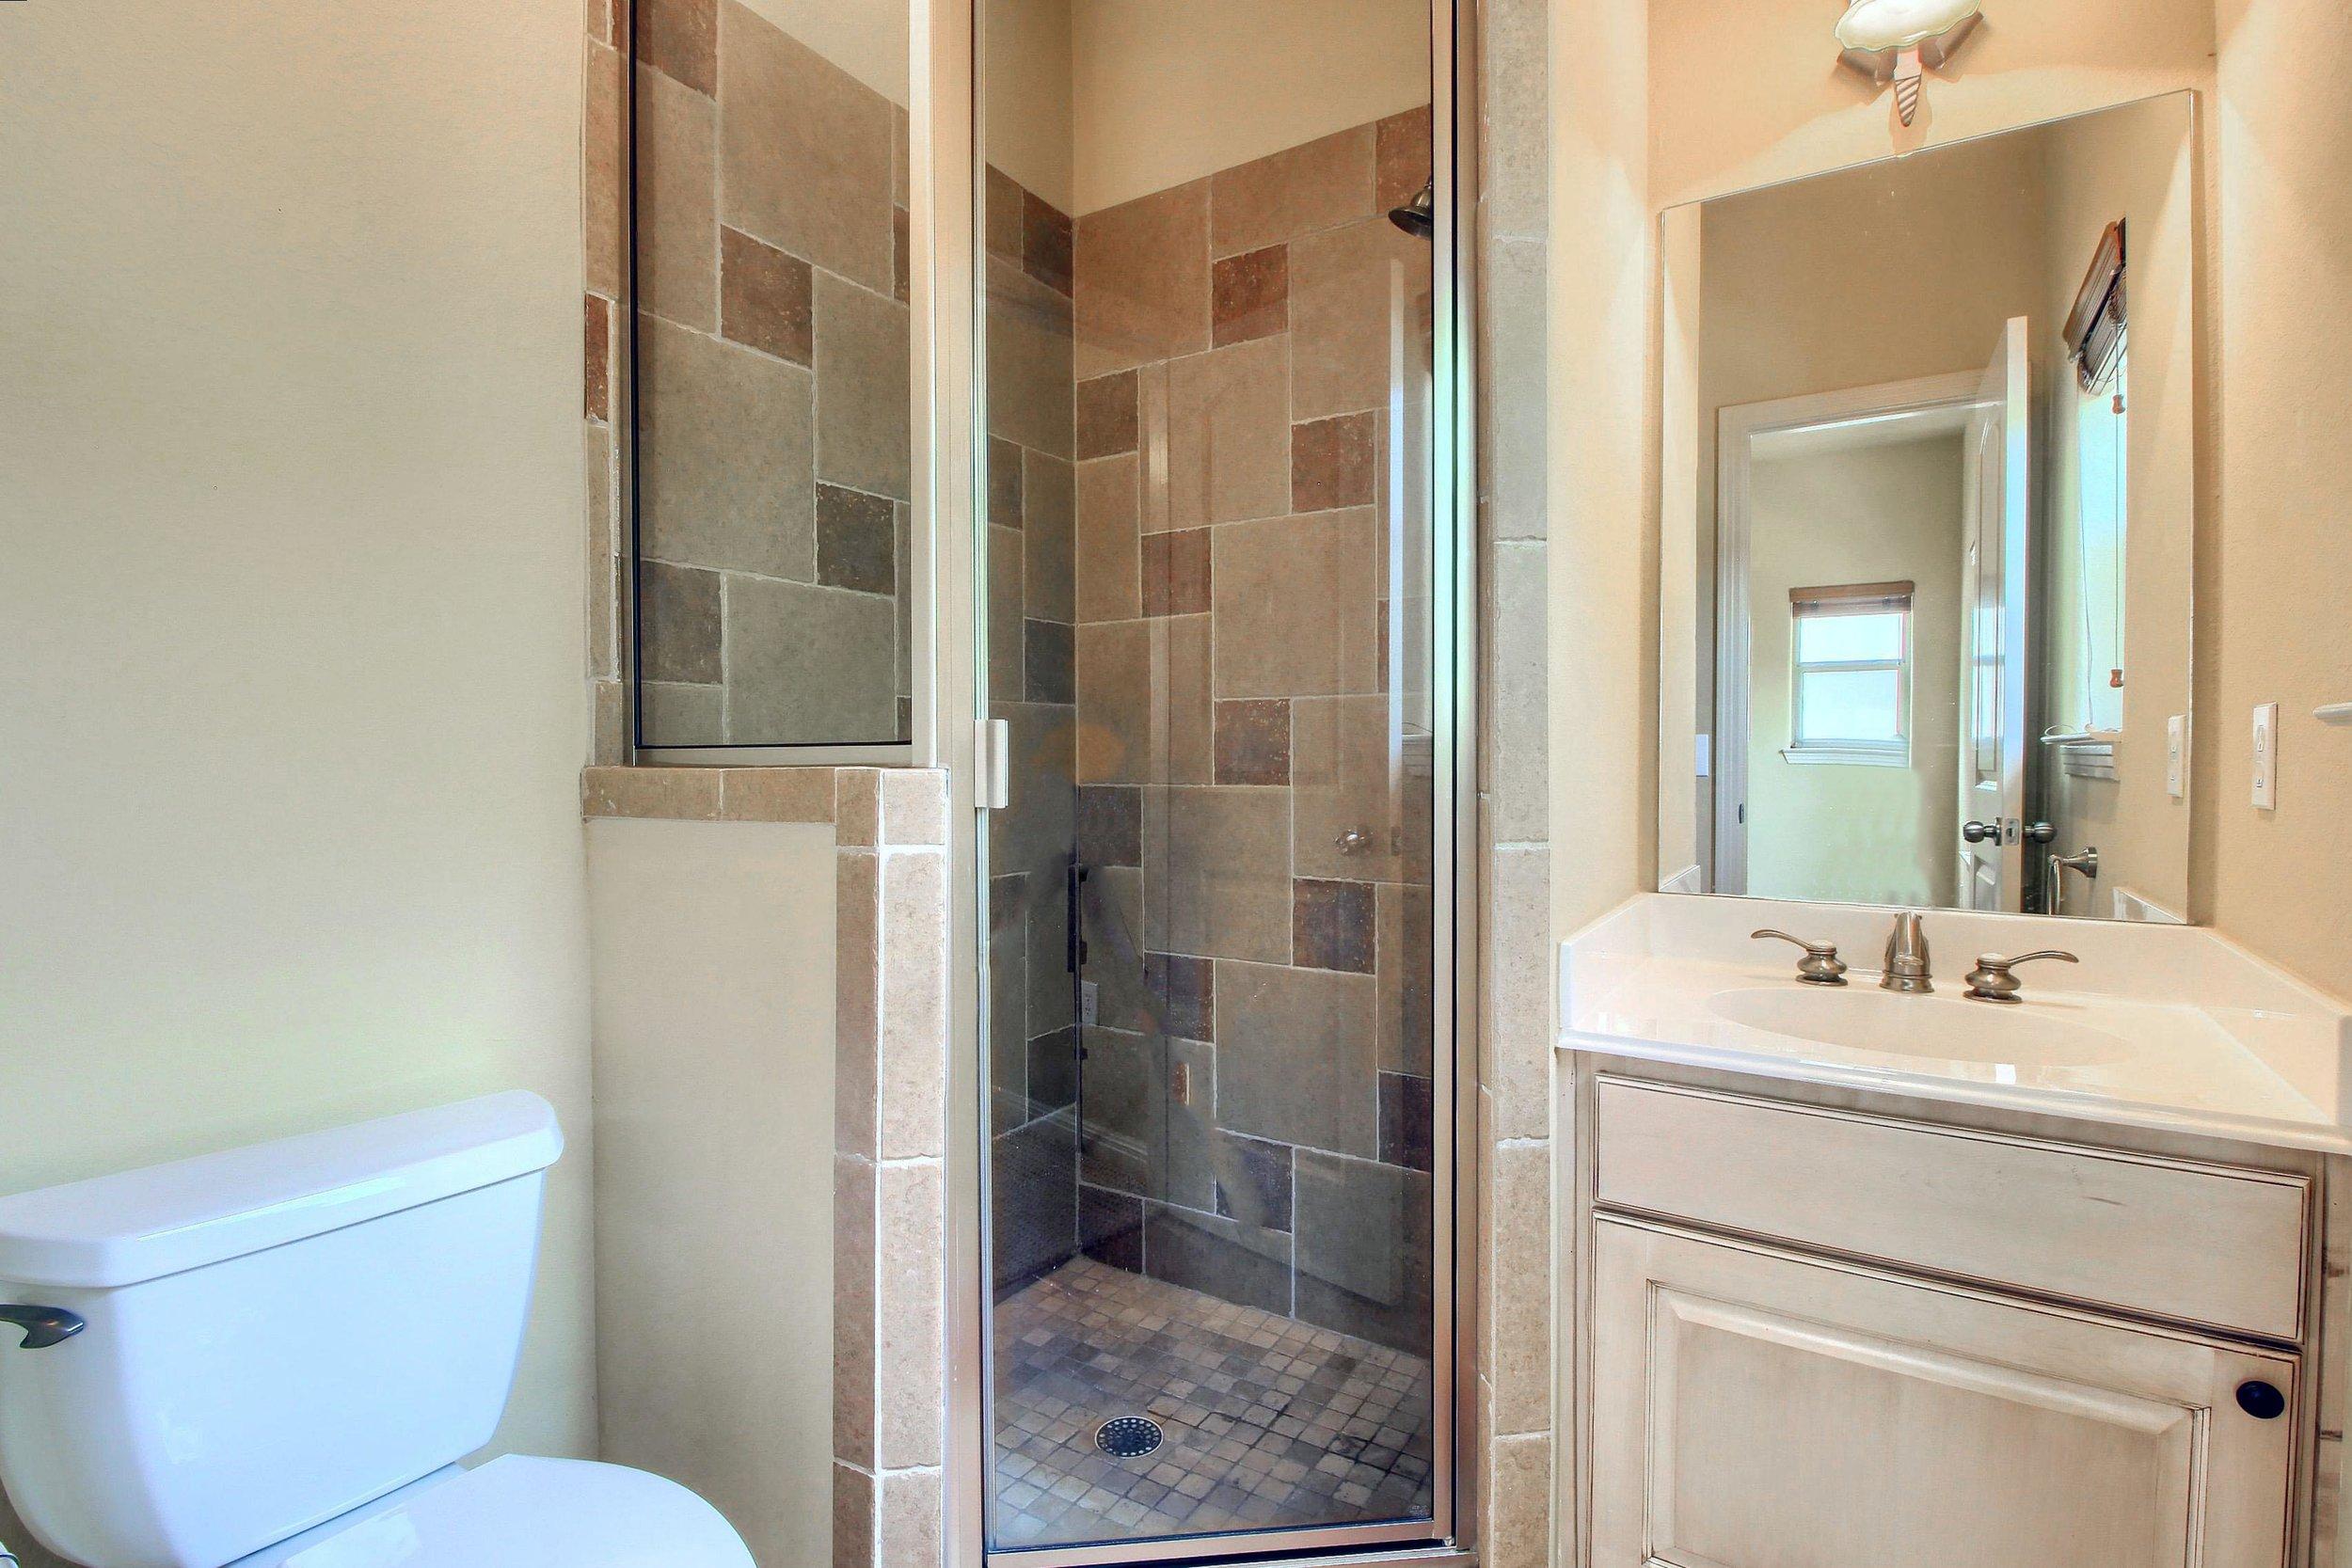 07_Bathroom_IMG_0926.JPG